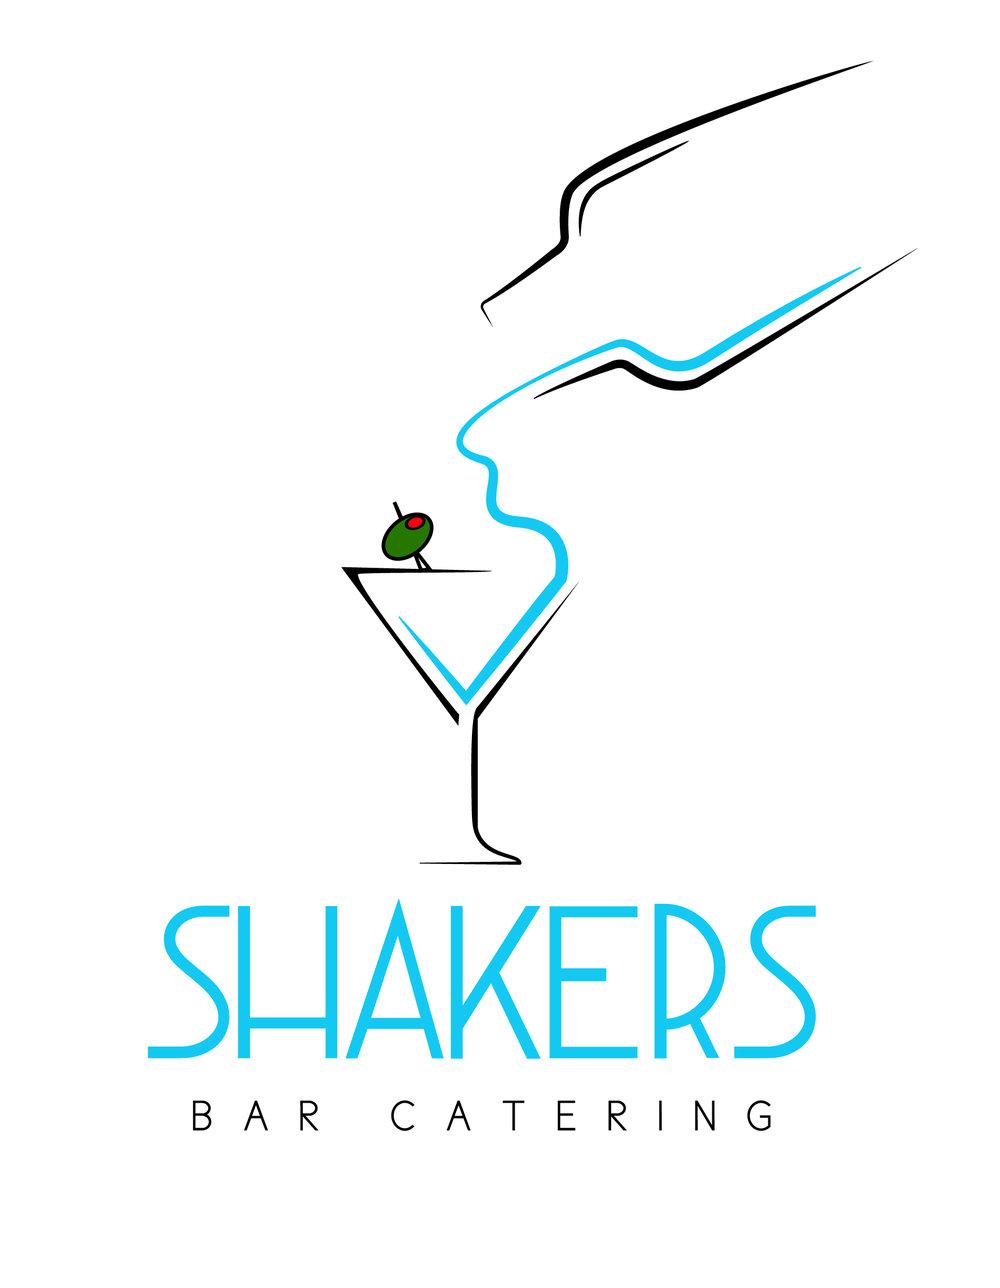 ShakersLogoWHITEbkgd_FINAL.jpg